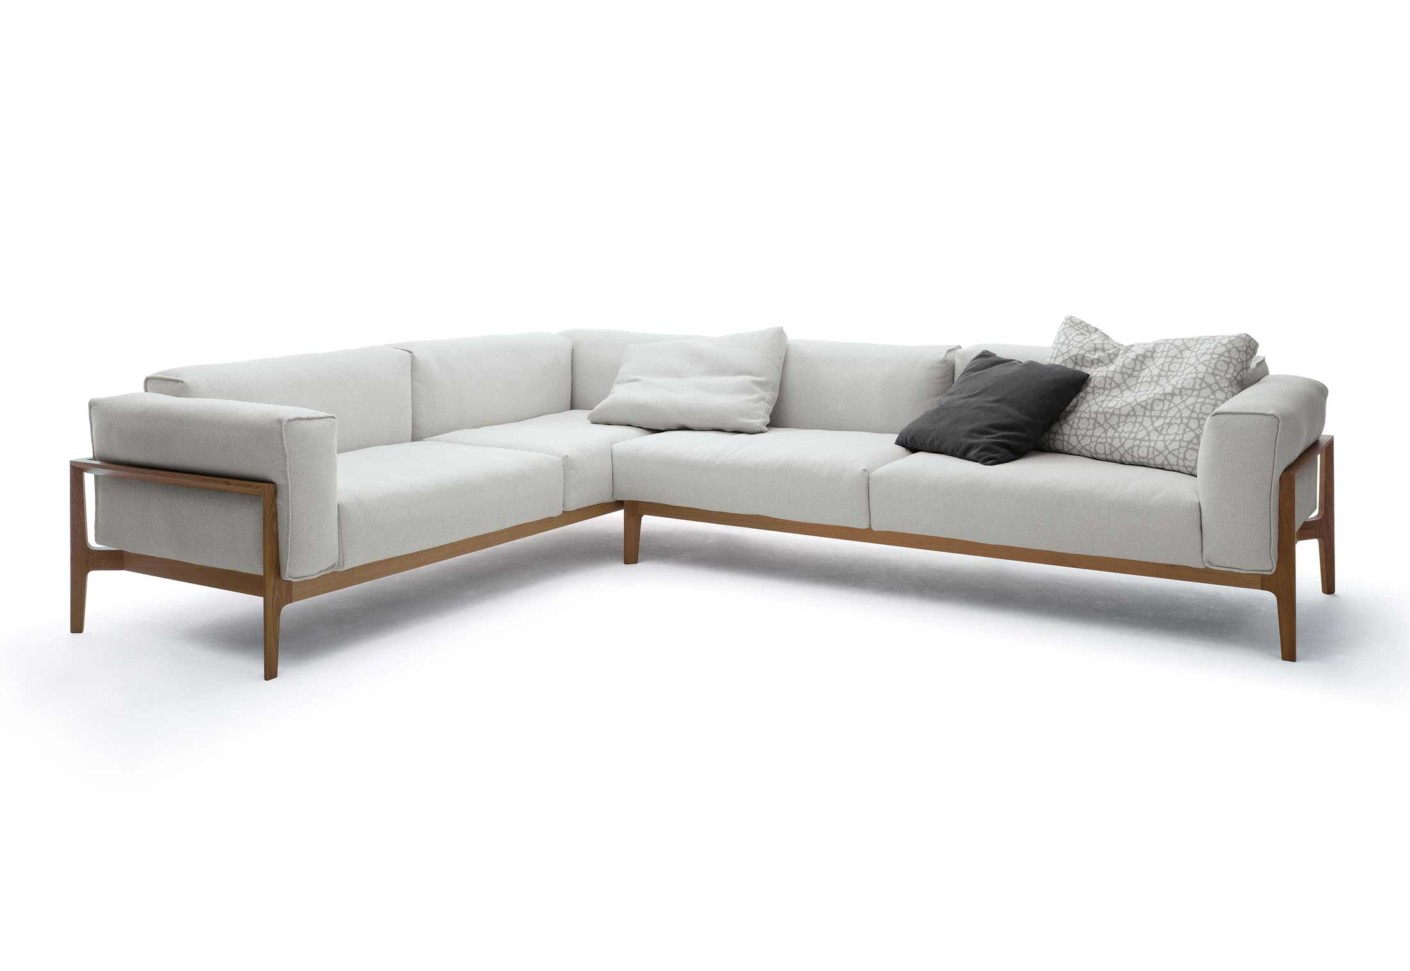 elm sofa von cor stylepark. Black Bedroom Furniture Sets. Home Design Ideas